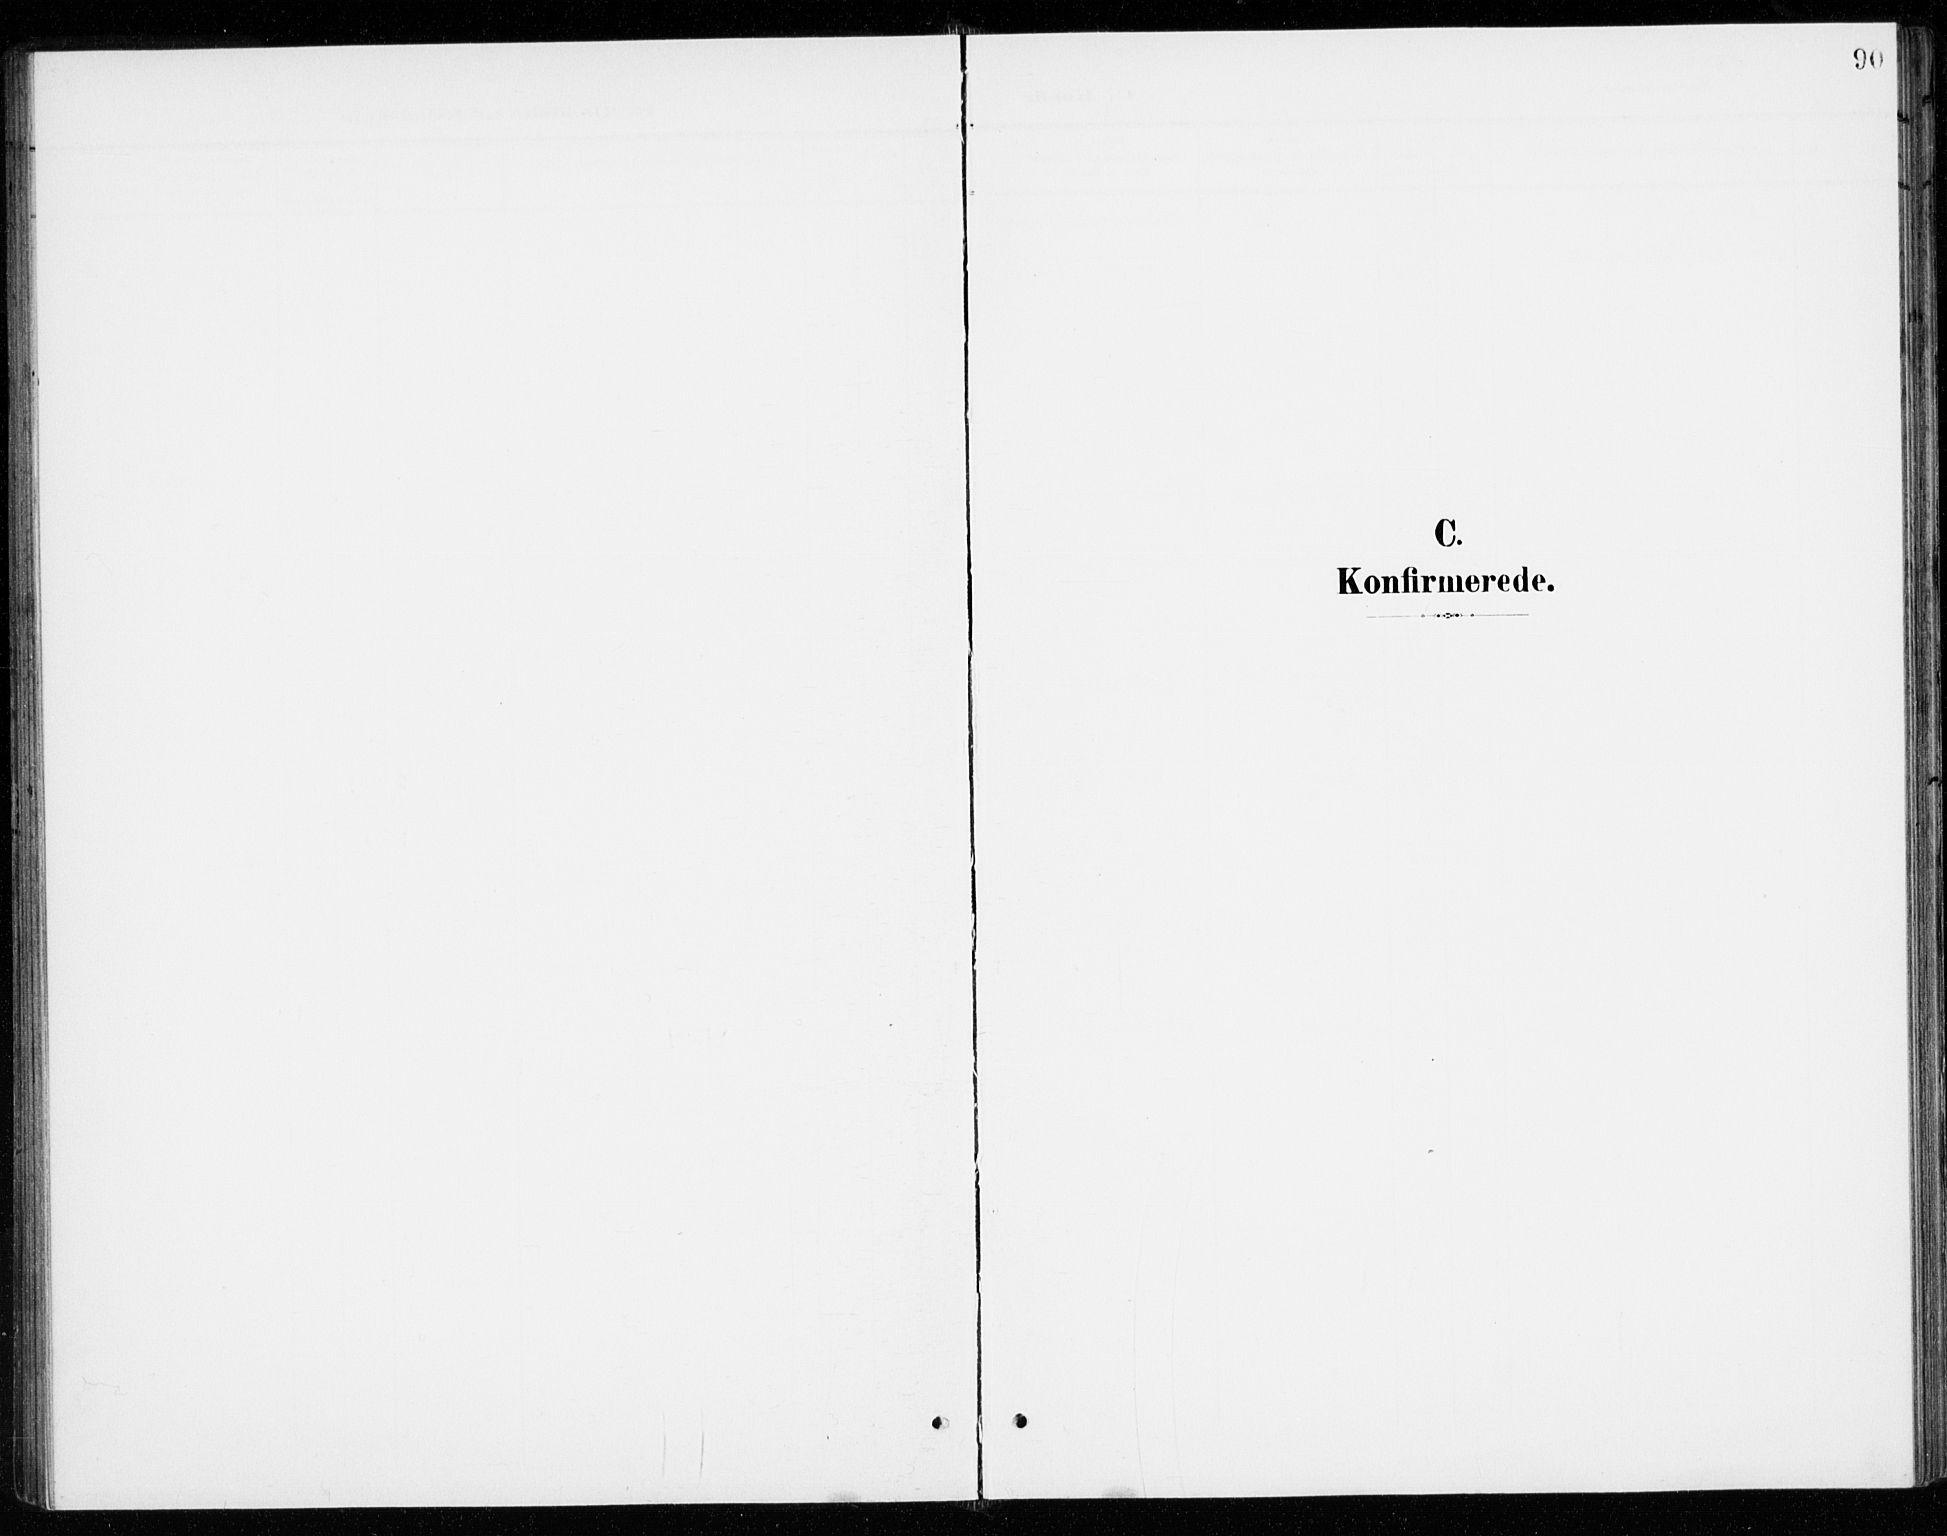 SAO, Gjerdrum prestekontor Kirkebøker, G/Gb/L0001: Klokkerbok nr. II 1, 1901-1944, s. 90